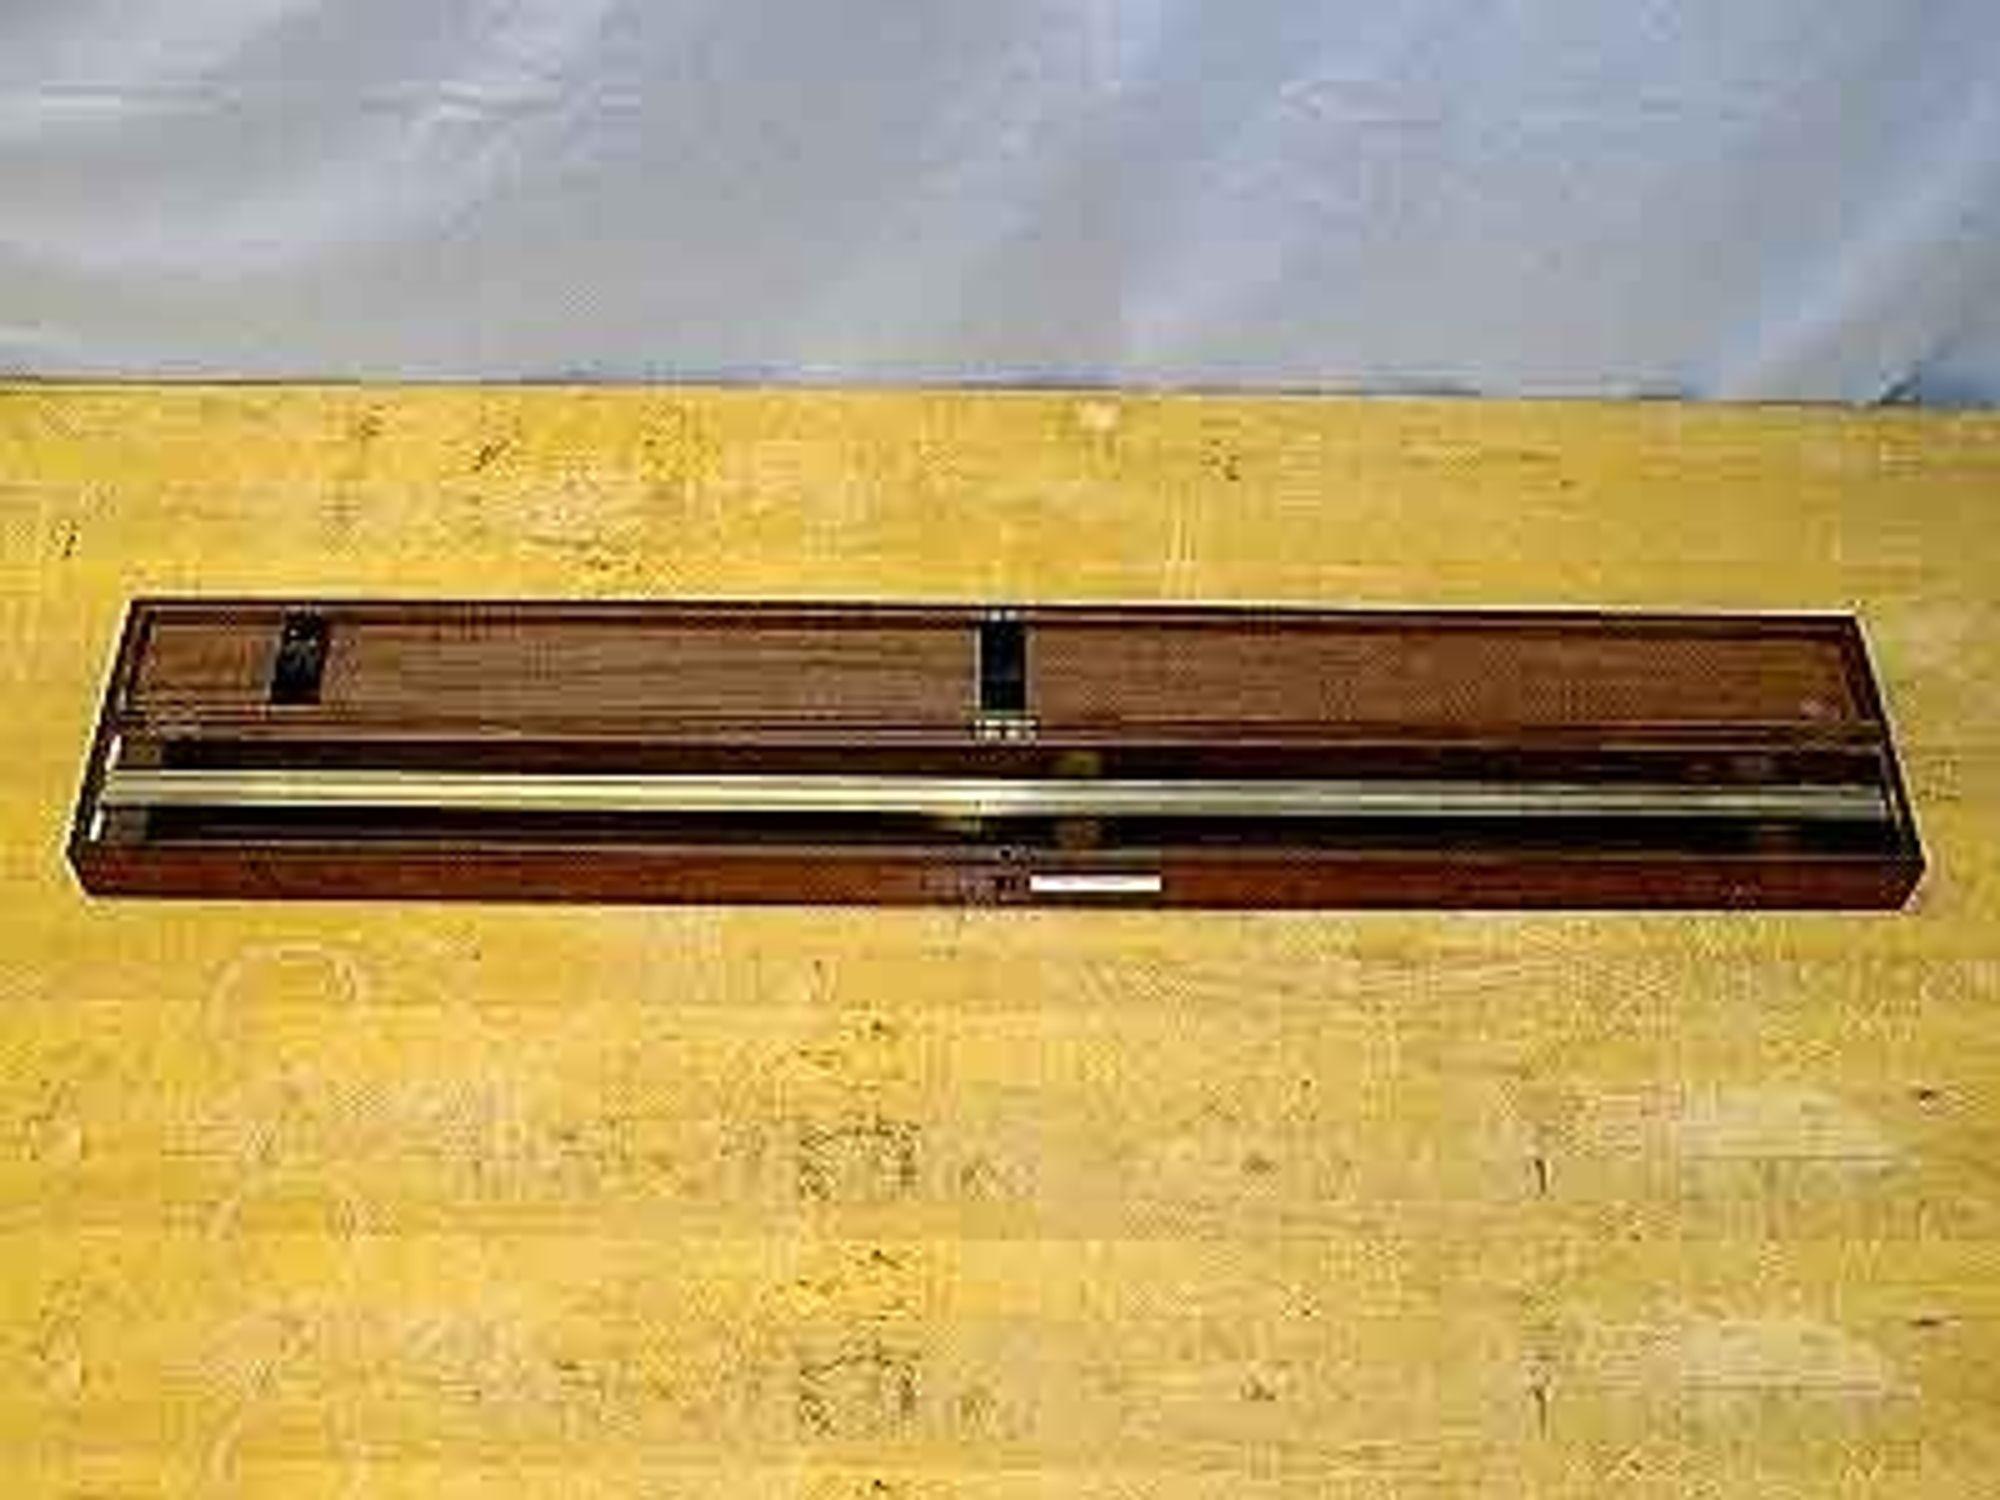 En kopi av platina-irridium-barren som definerer den nøyaktige meteren. Arkivfoto